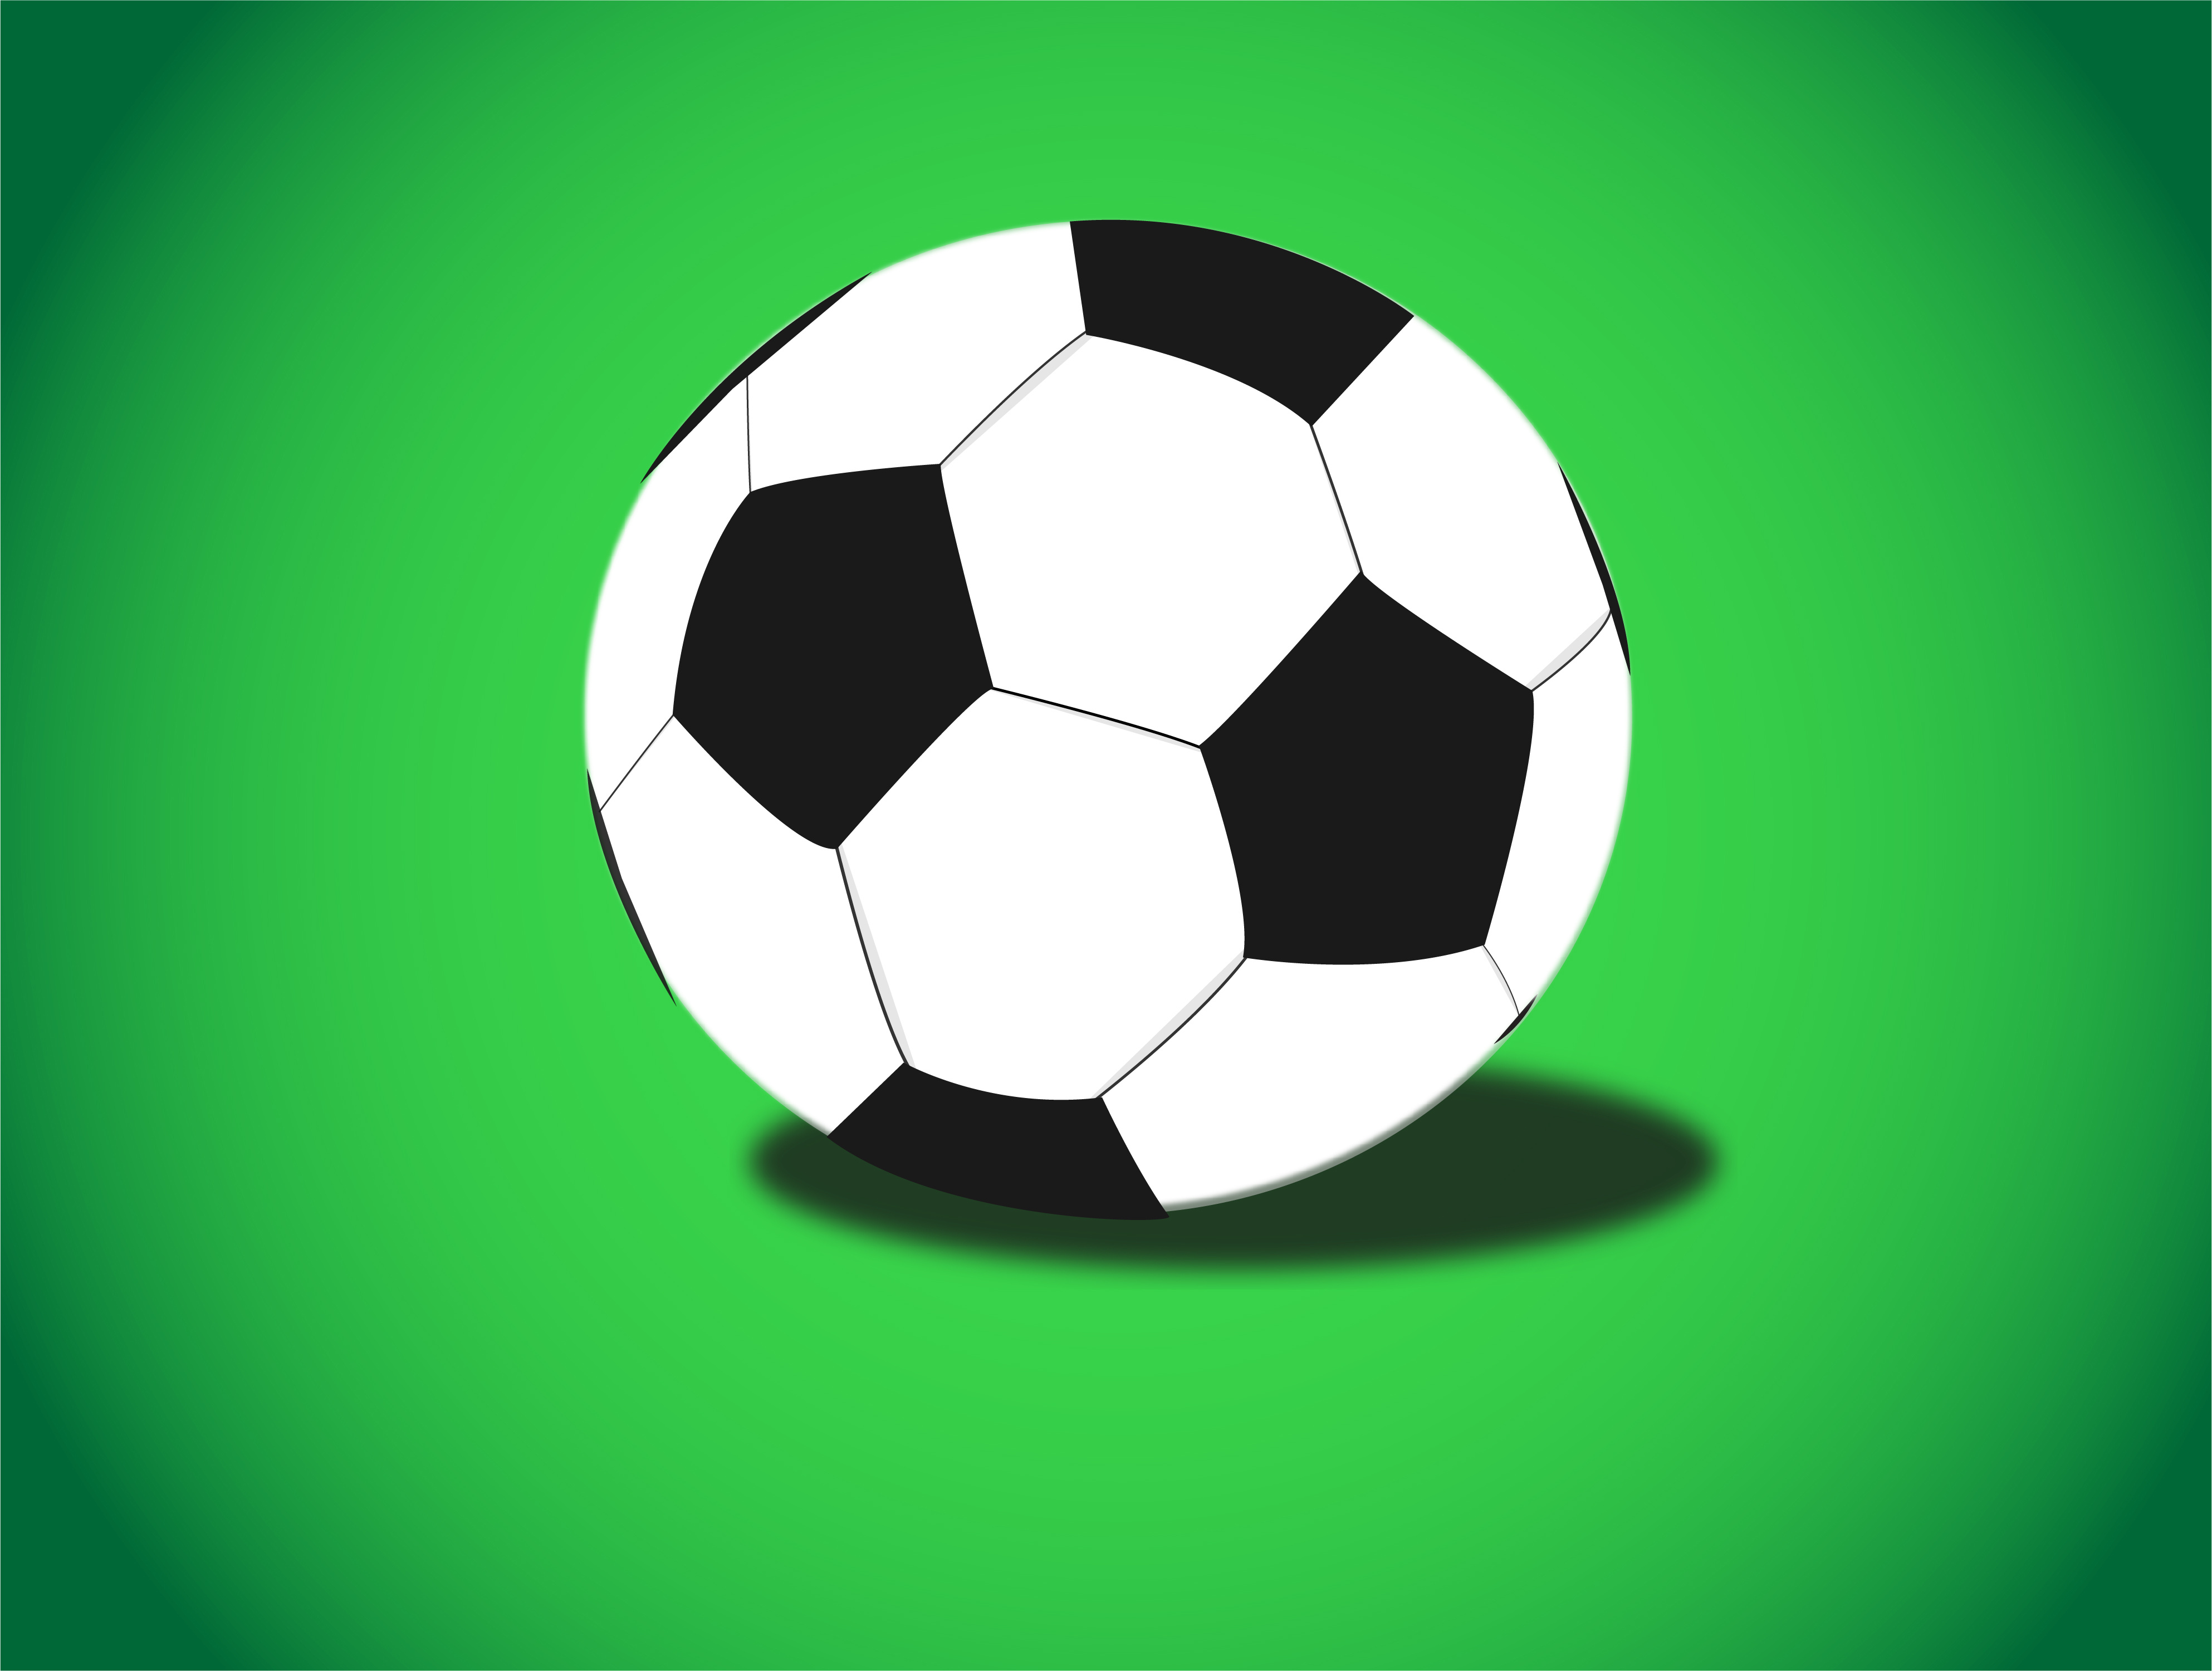 Illustration of soccer ball on green background